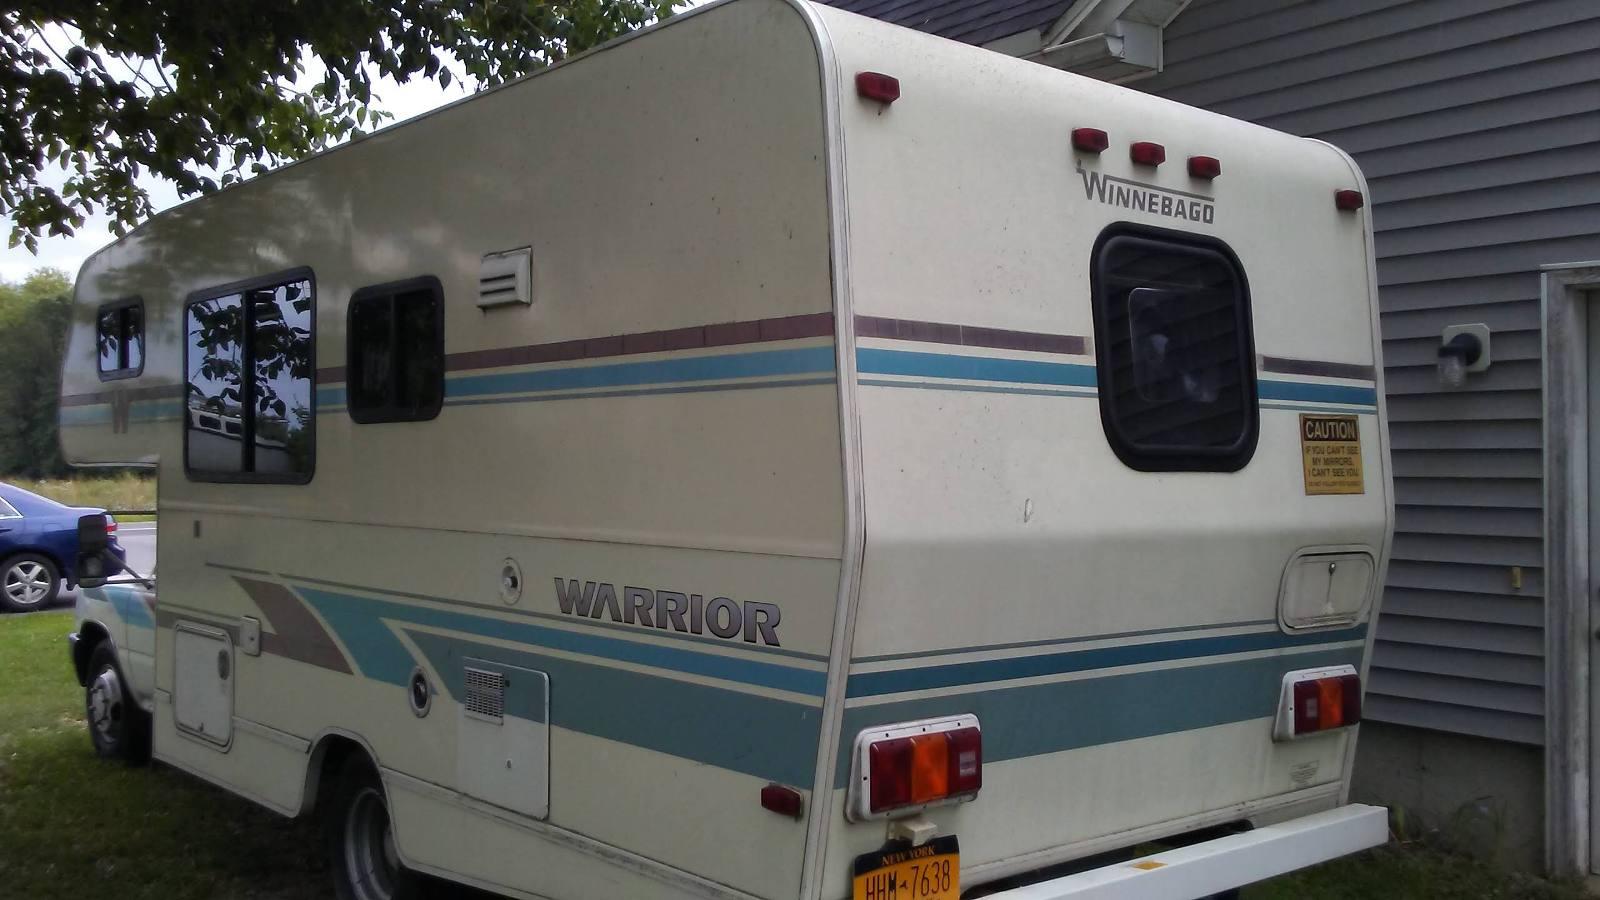 1993 Toyota Winnebago Warrior 21FT Motorhome For Sale in